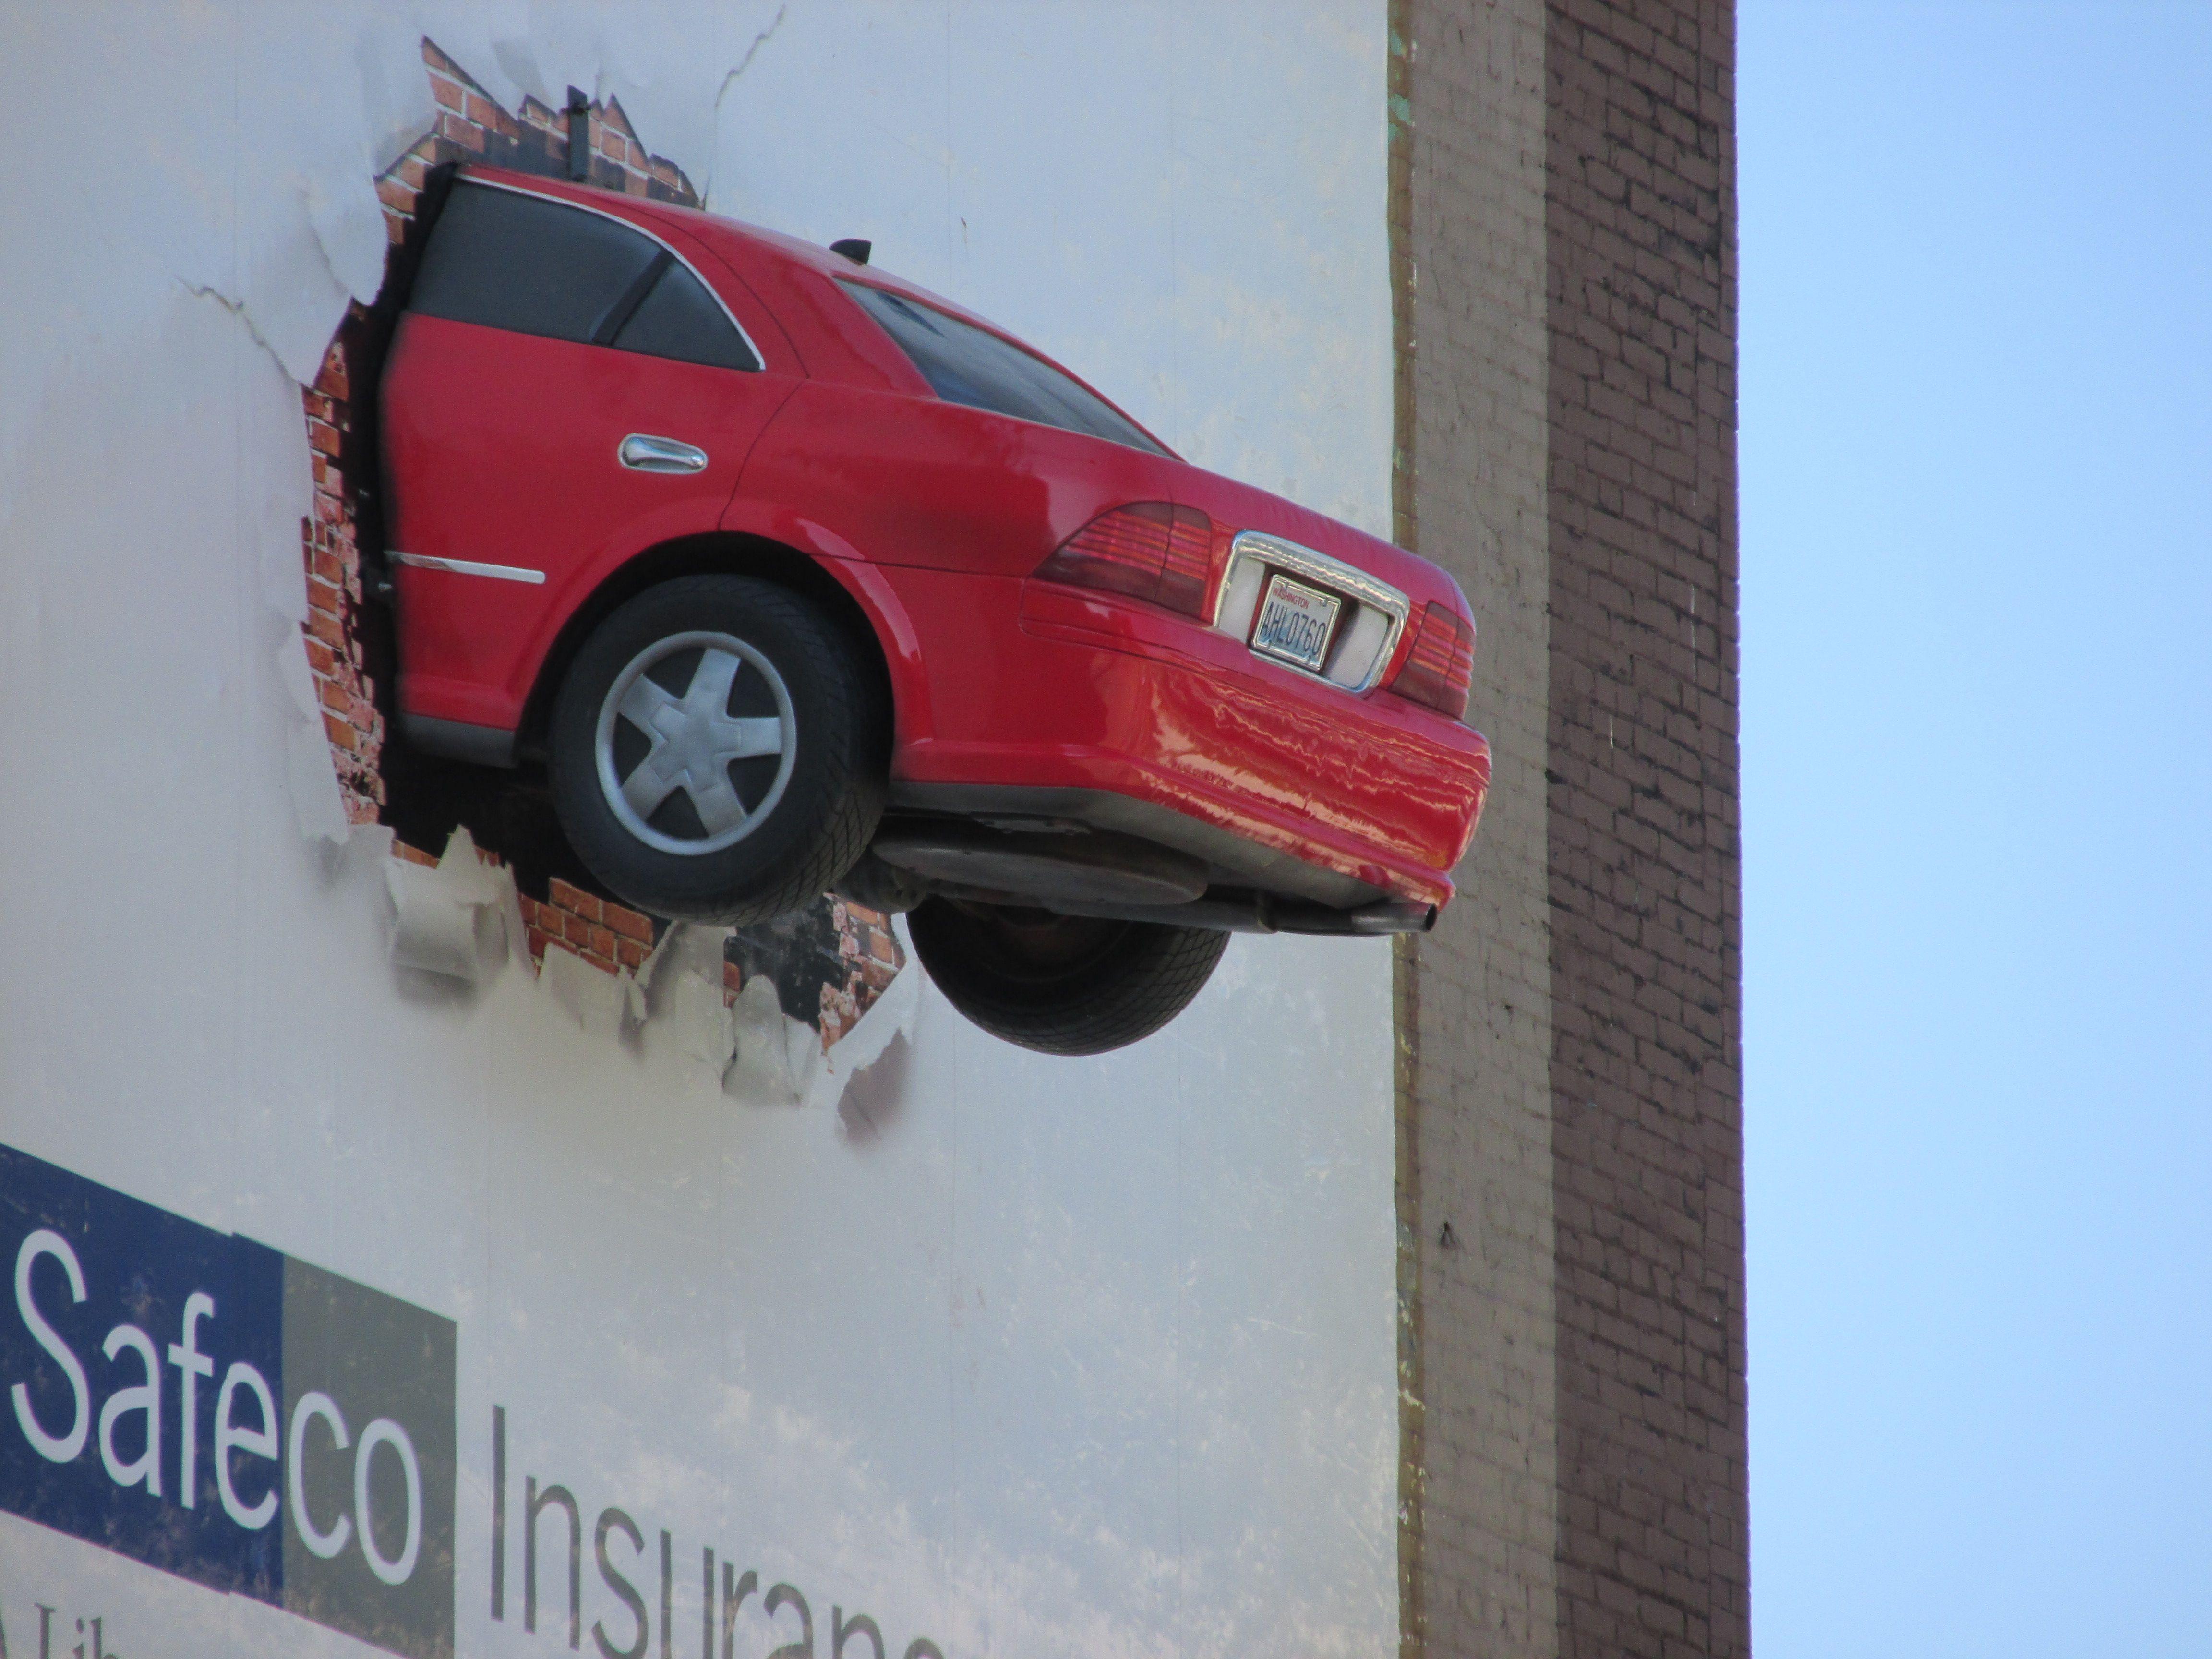 Safeco Car Insurance: 3D Billboard Advertising Solutions